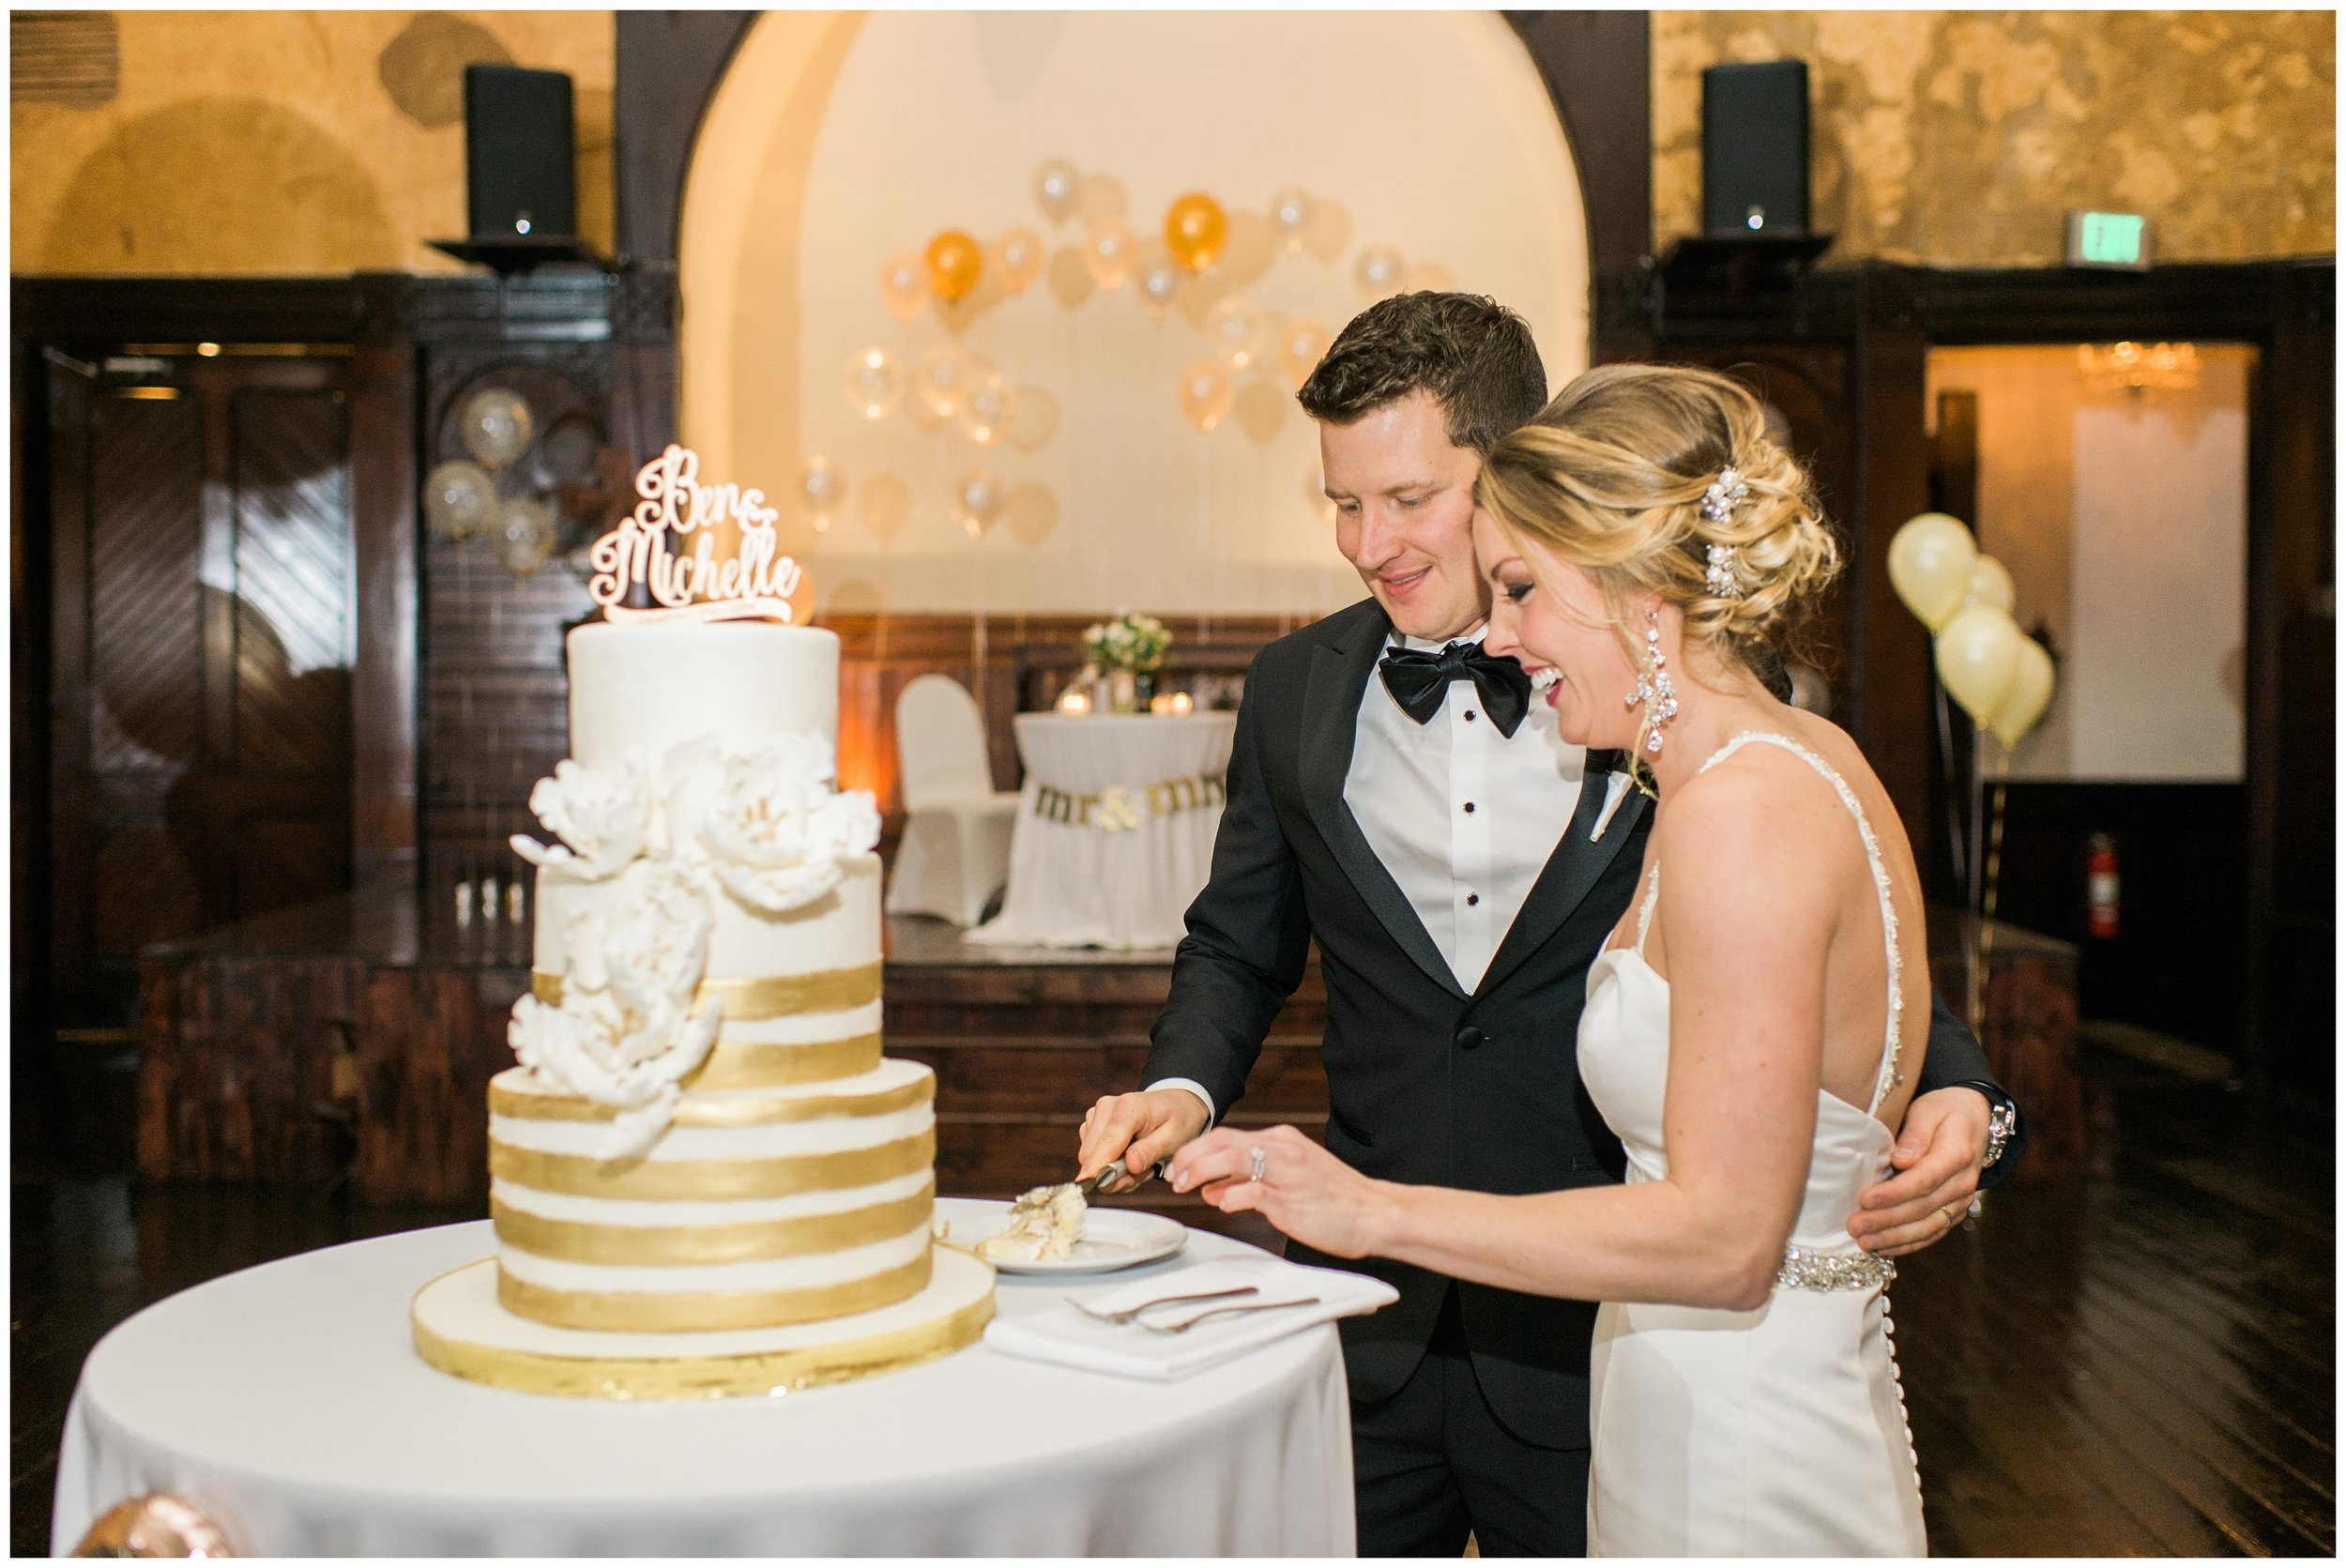 Rebecca_Bridges_Photography_Indianapolis_Wedding_Photographer_5849.jpg